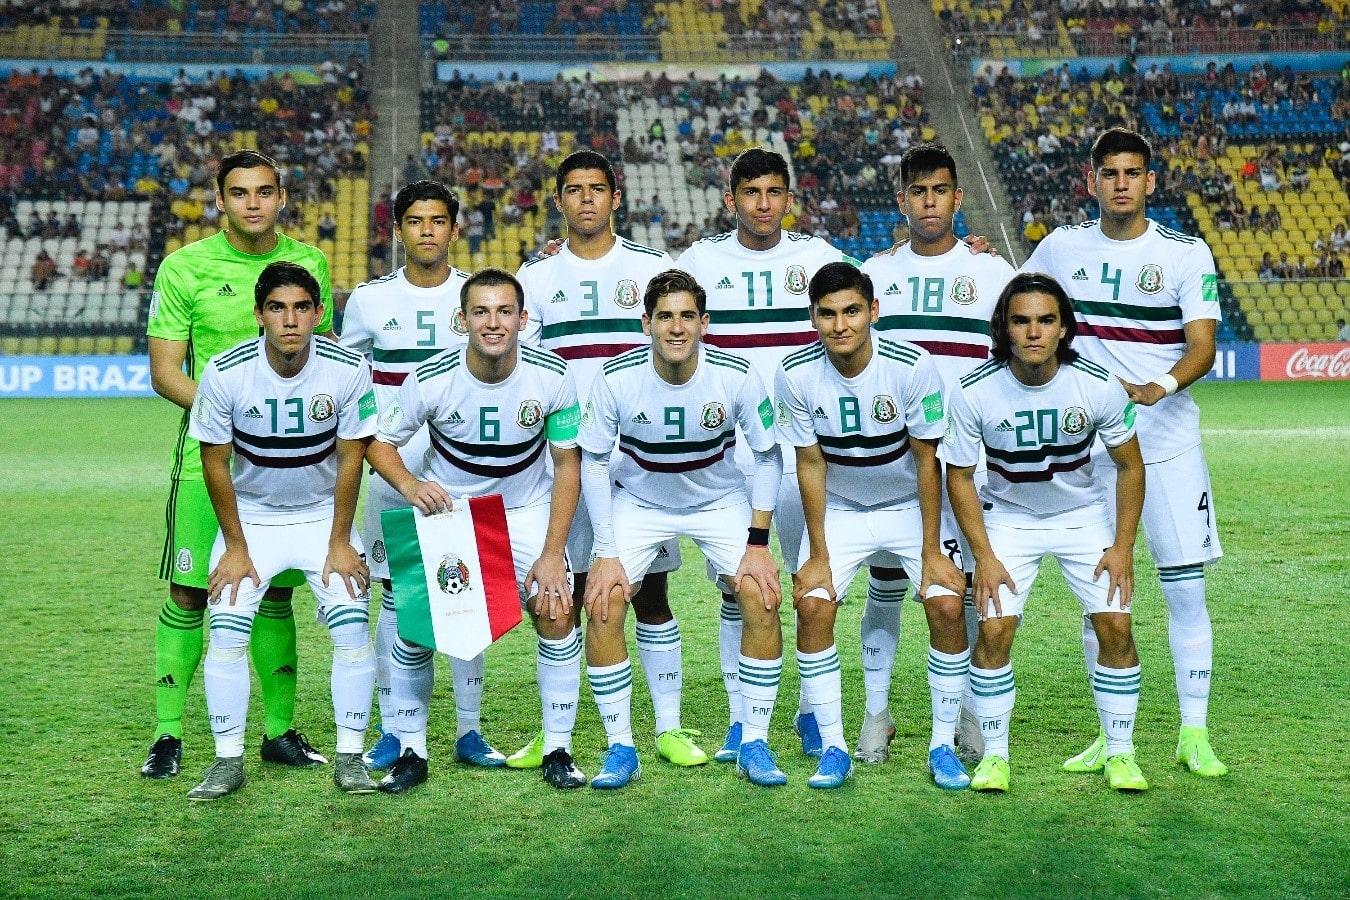 Sub-17 futbol